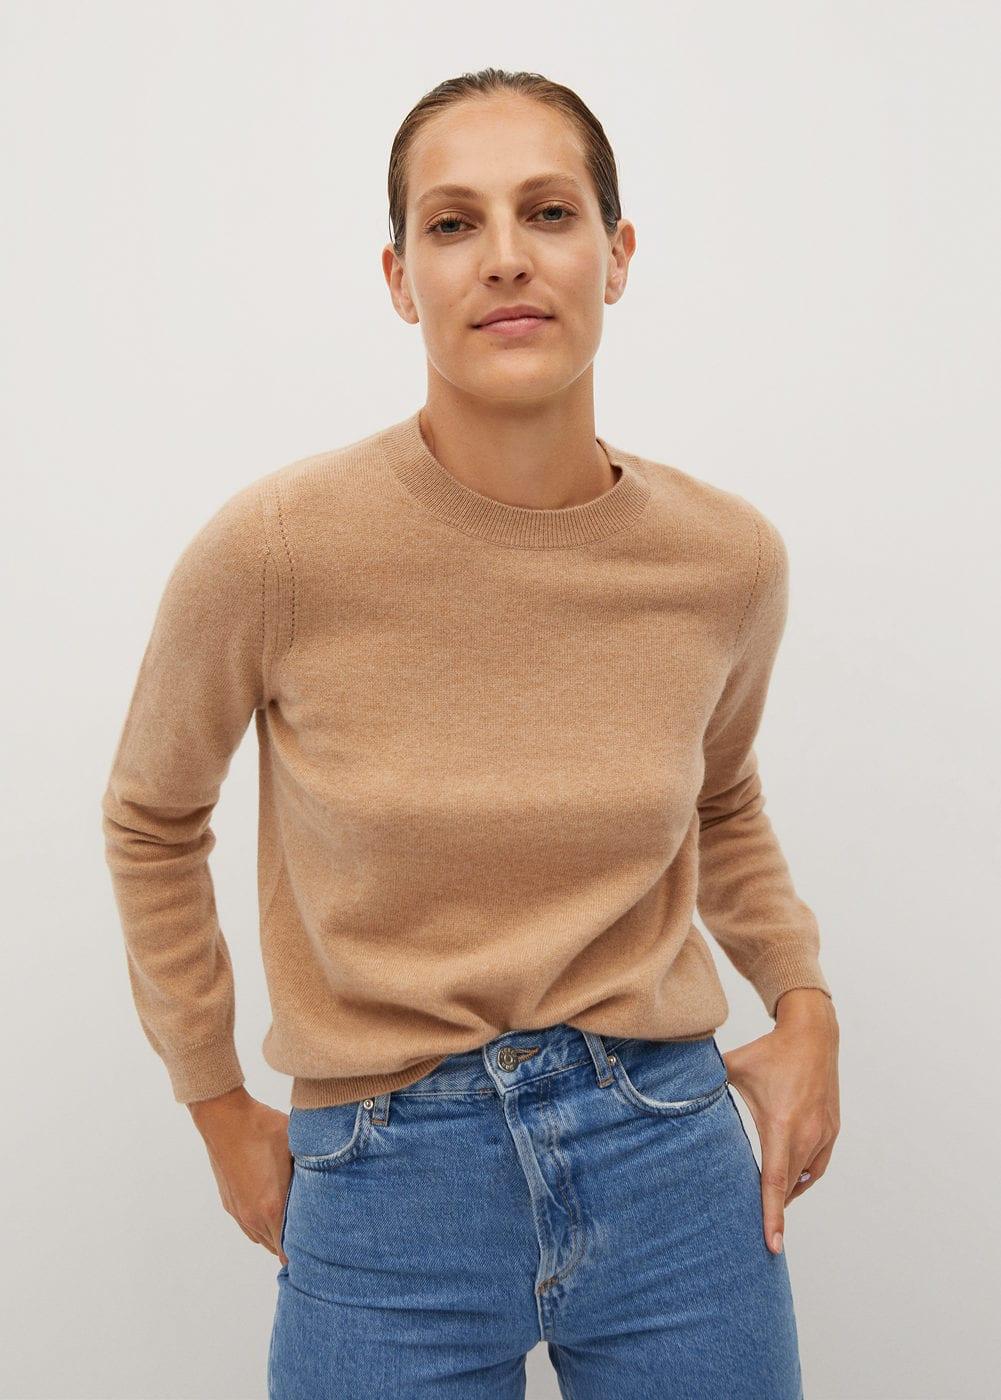 m-bahia:jersey 100% cashmere